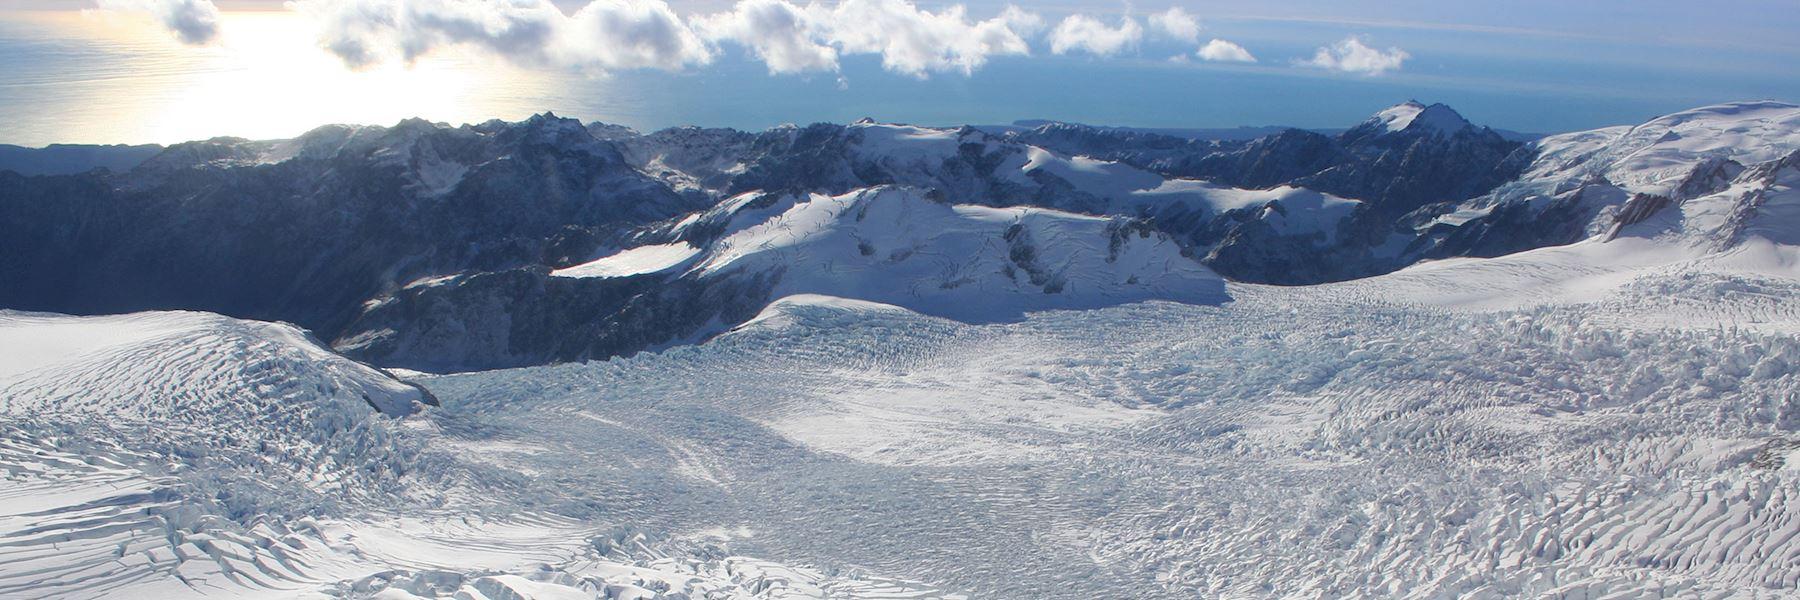 Visit Fox & Franz Josef Glaciers, New Zealand